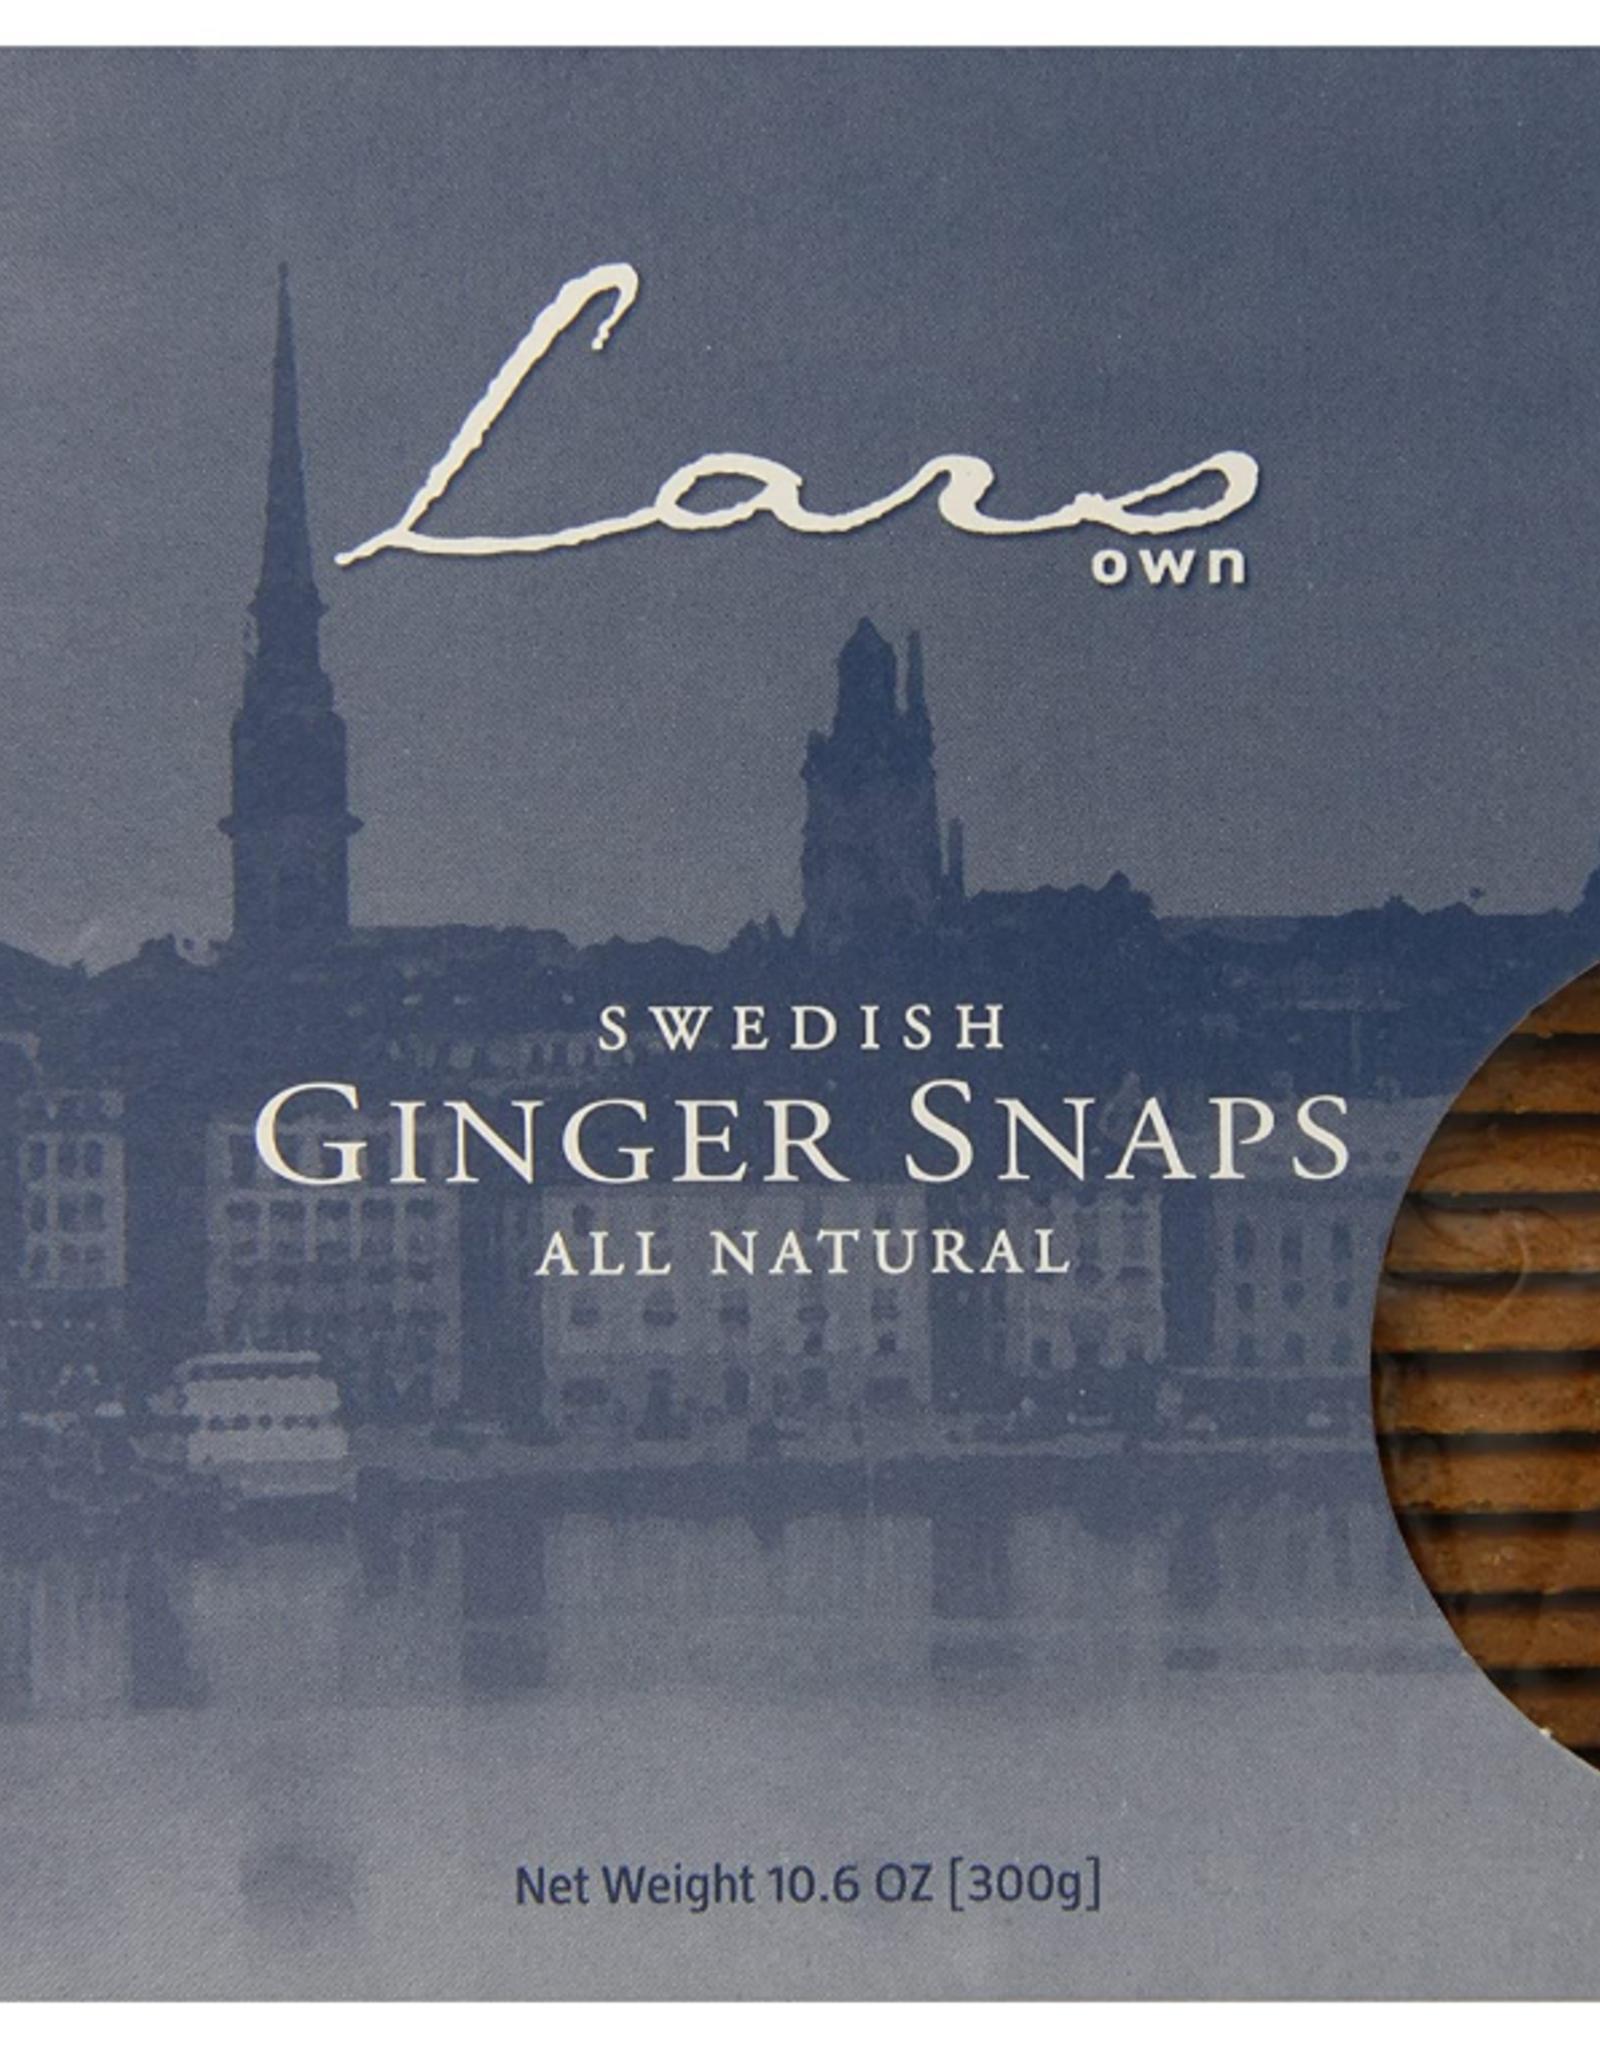 European Imports Lars' Own Ginger Snaps